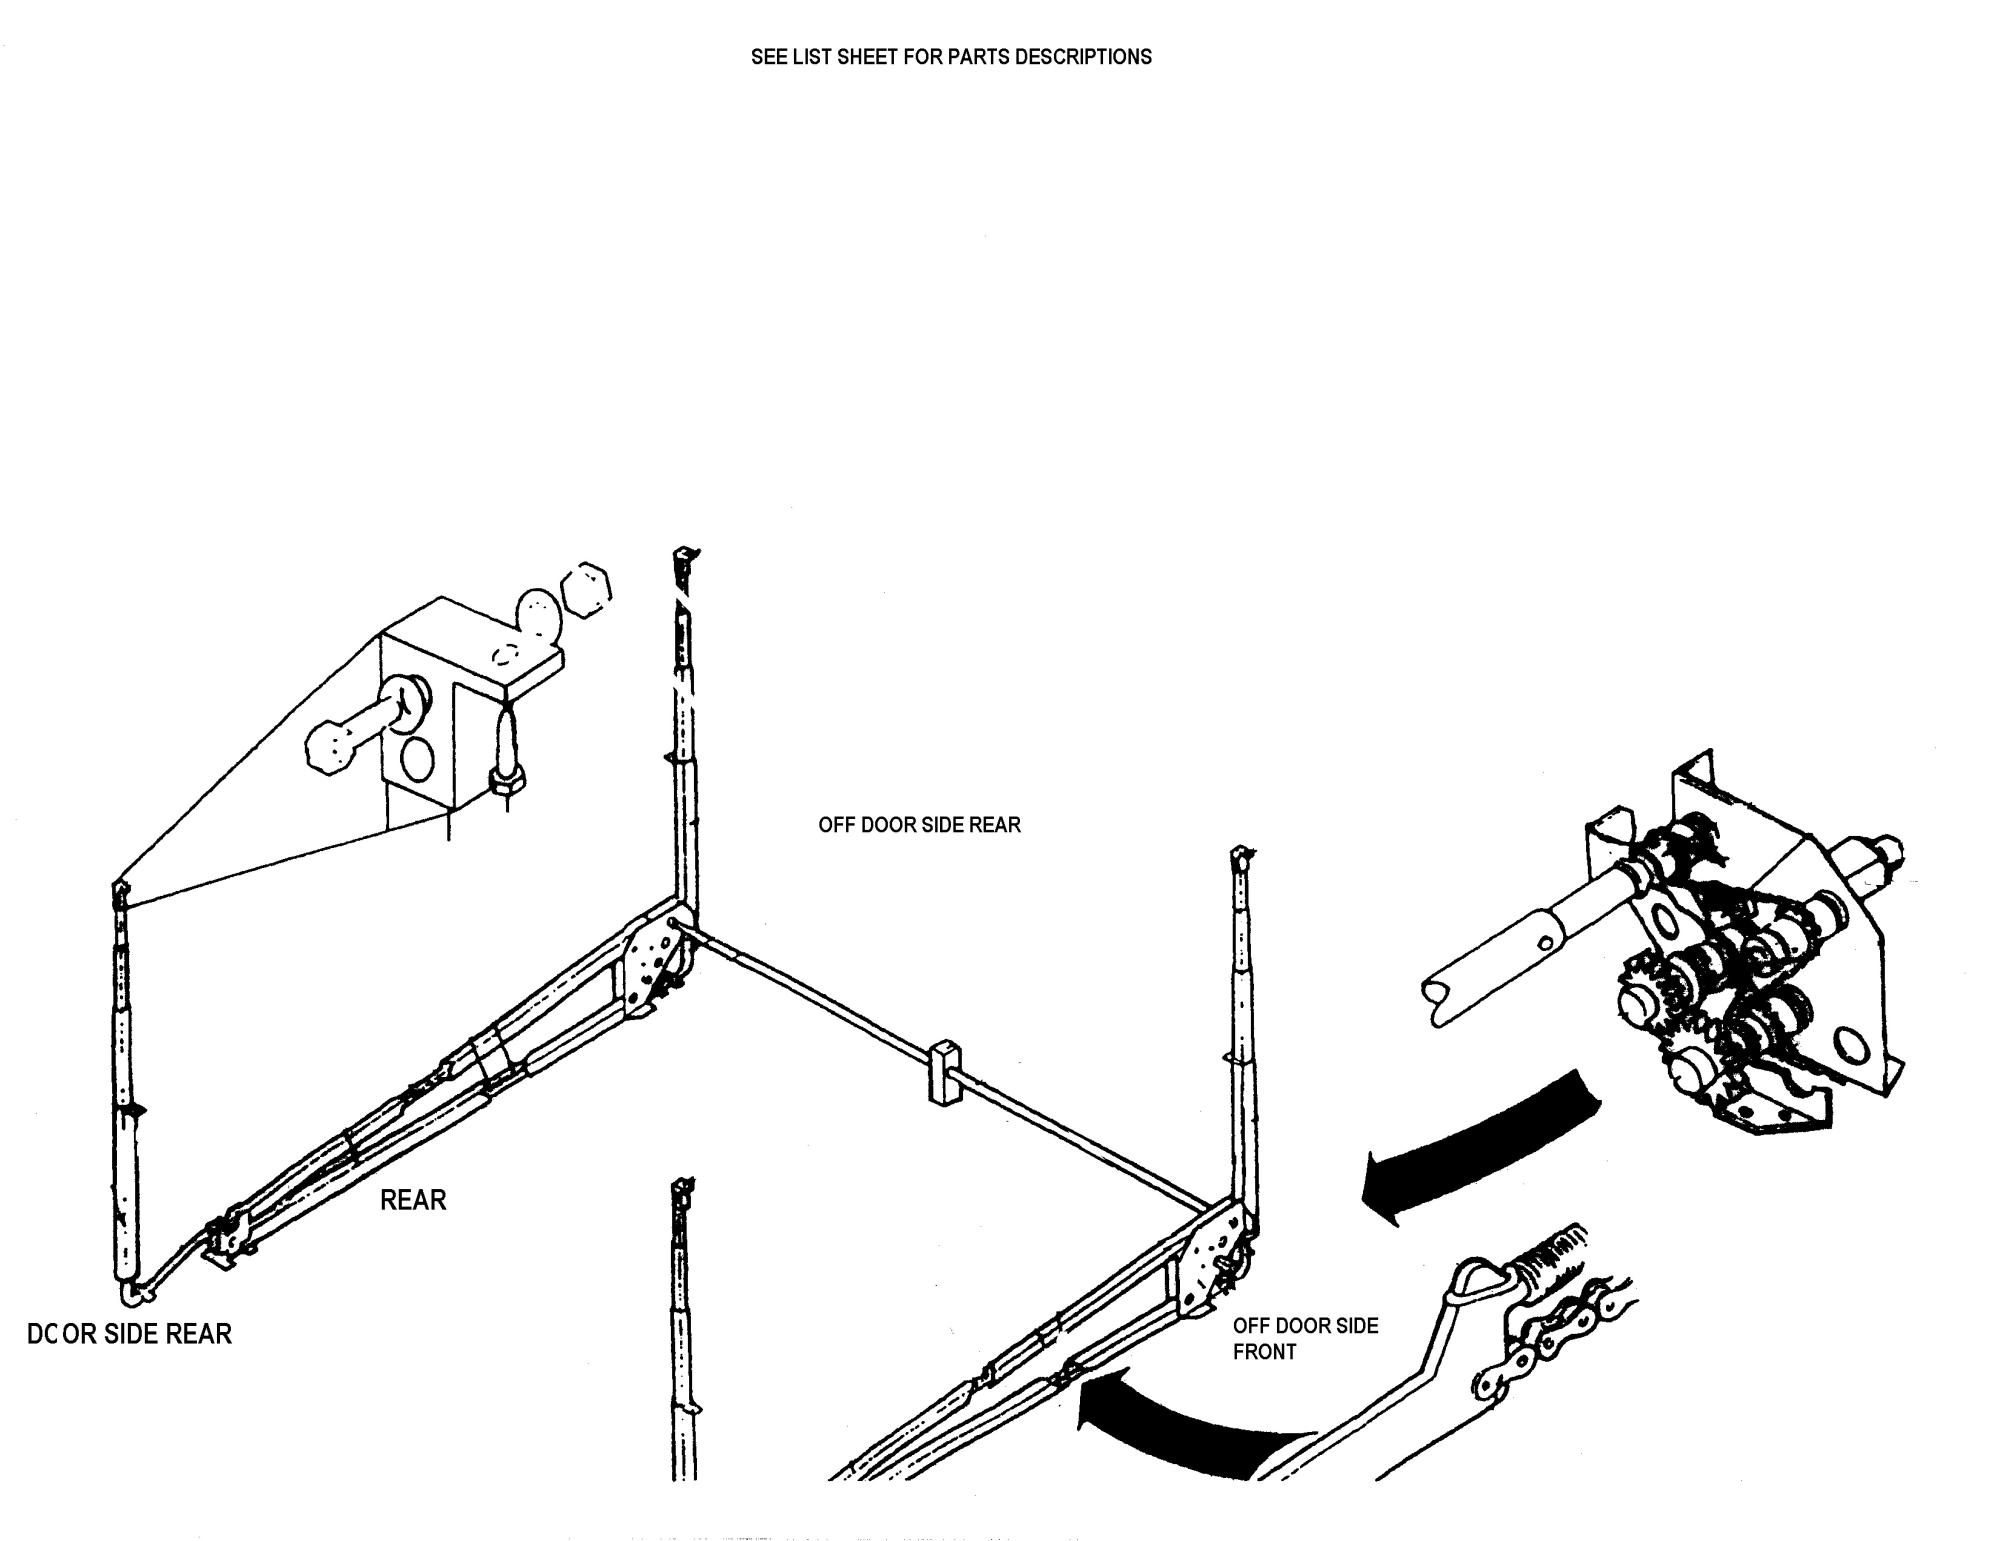 coleman pop up camper wiring diagram pop up camper wiring diagram